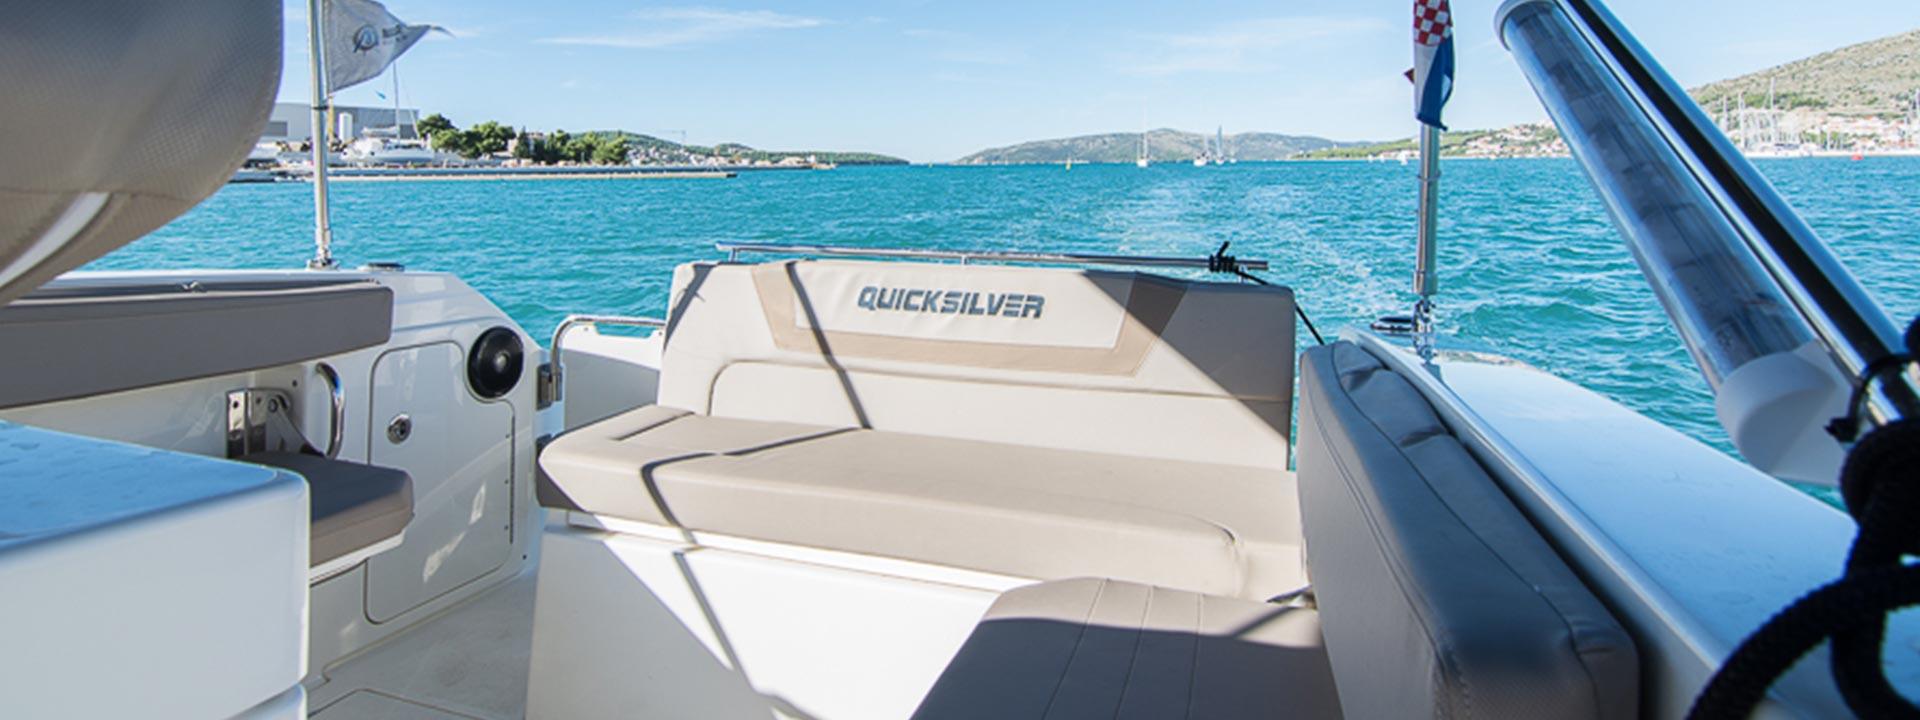 mayer-charter-boat-header-jeanneau-quicksilver-actv-805-03